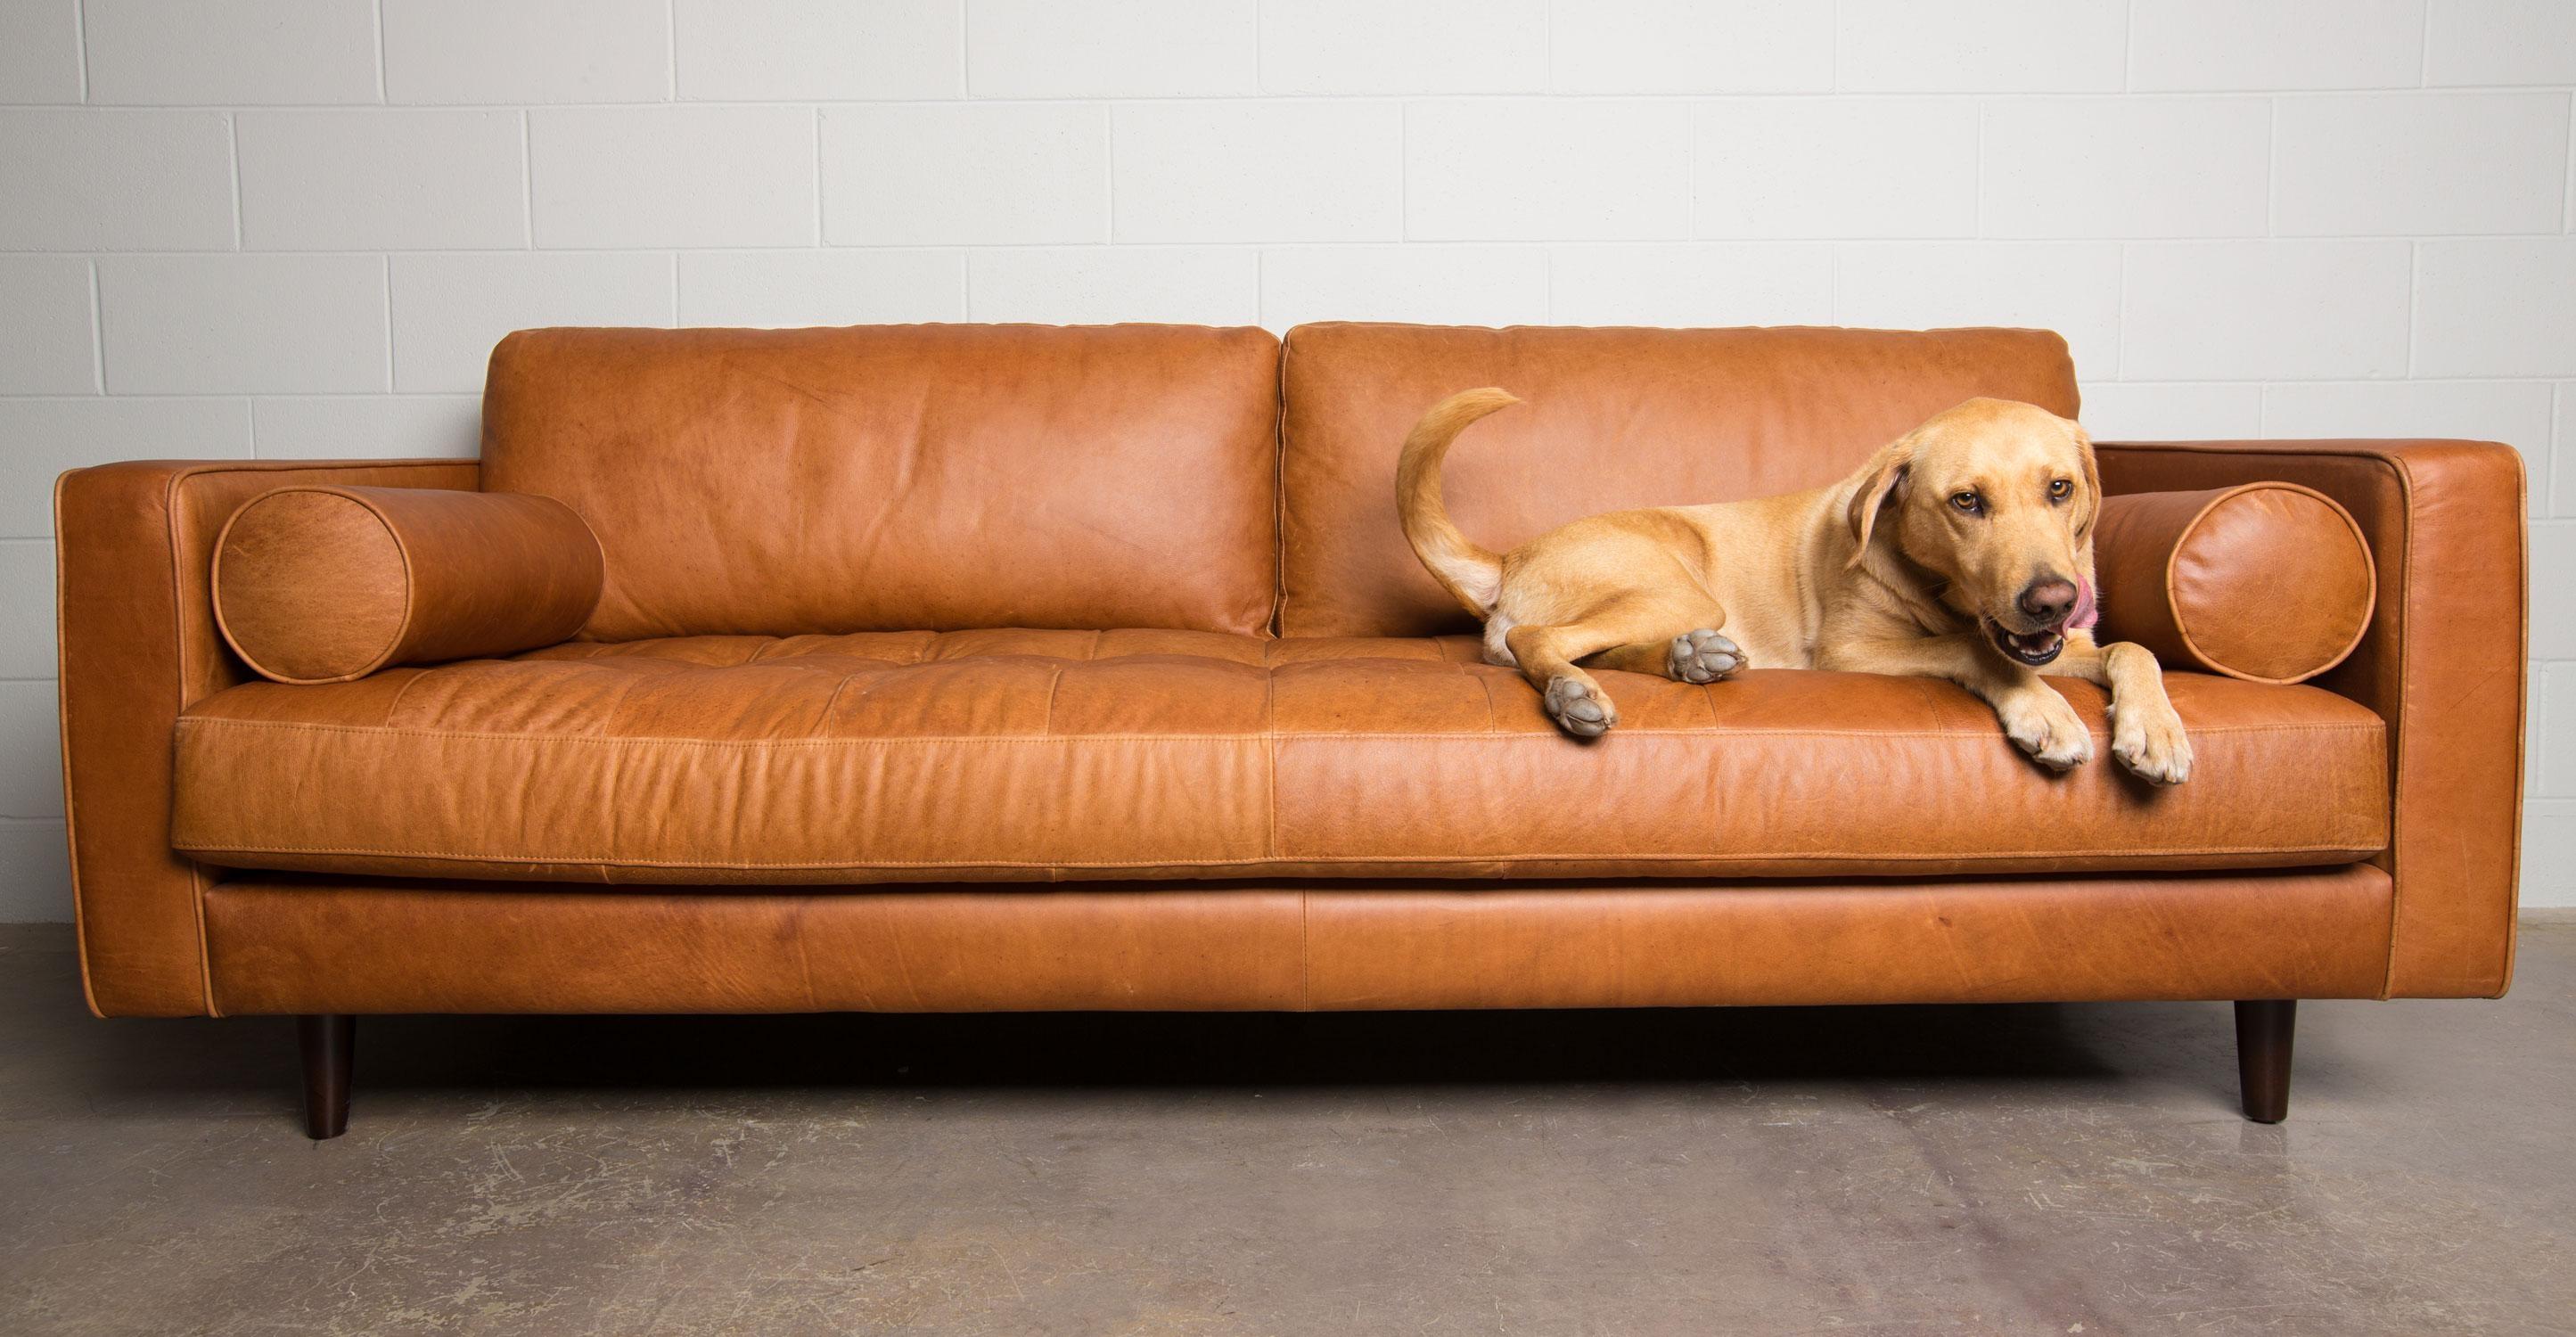 caramel colored leather sofas bernhardt sofa colors 20 ideas of